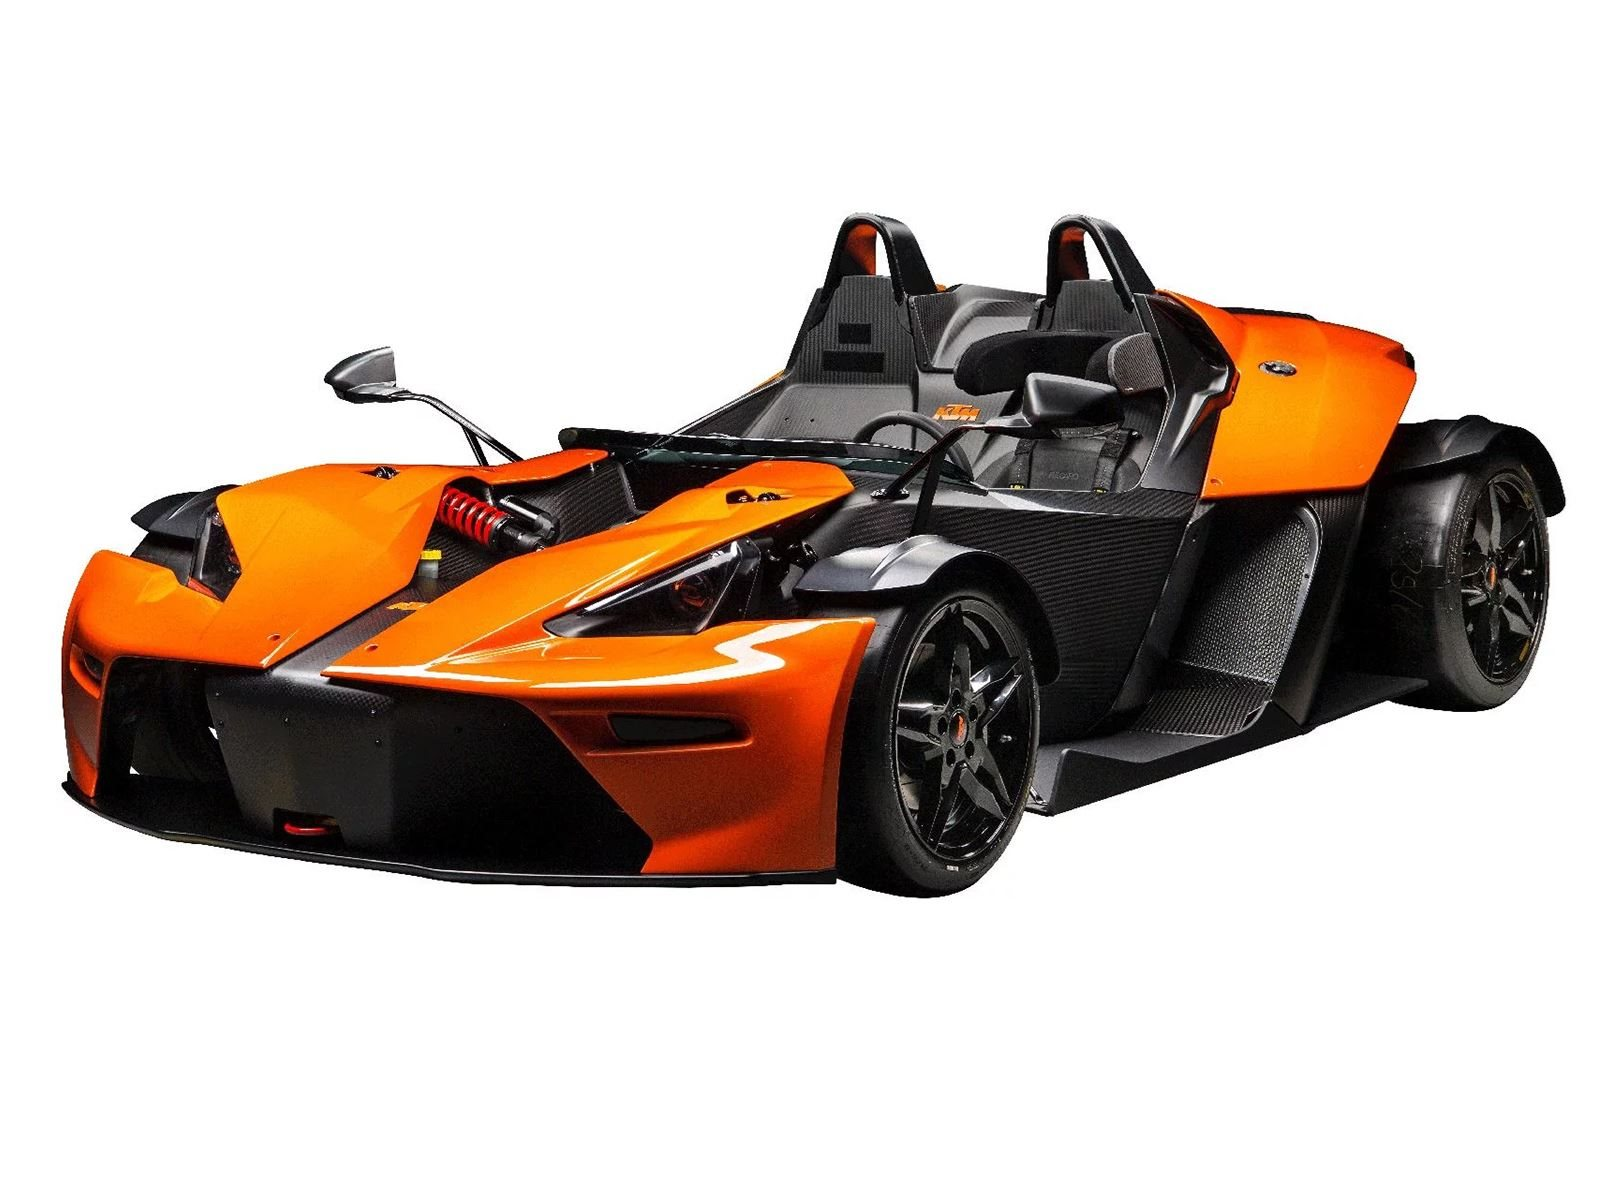 Тем не менее, он все же намного легче, чем Mazda MX-5.